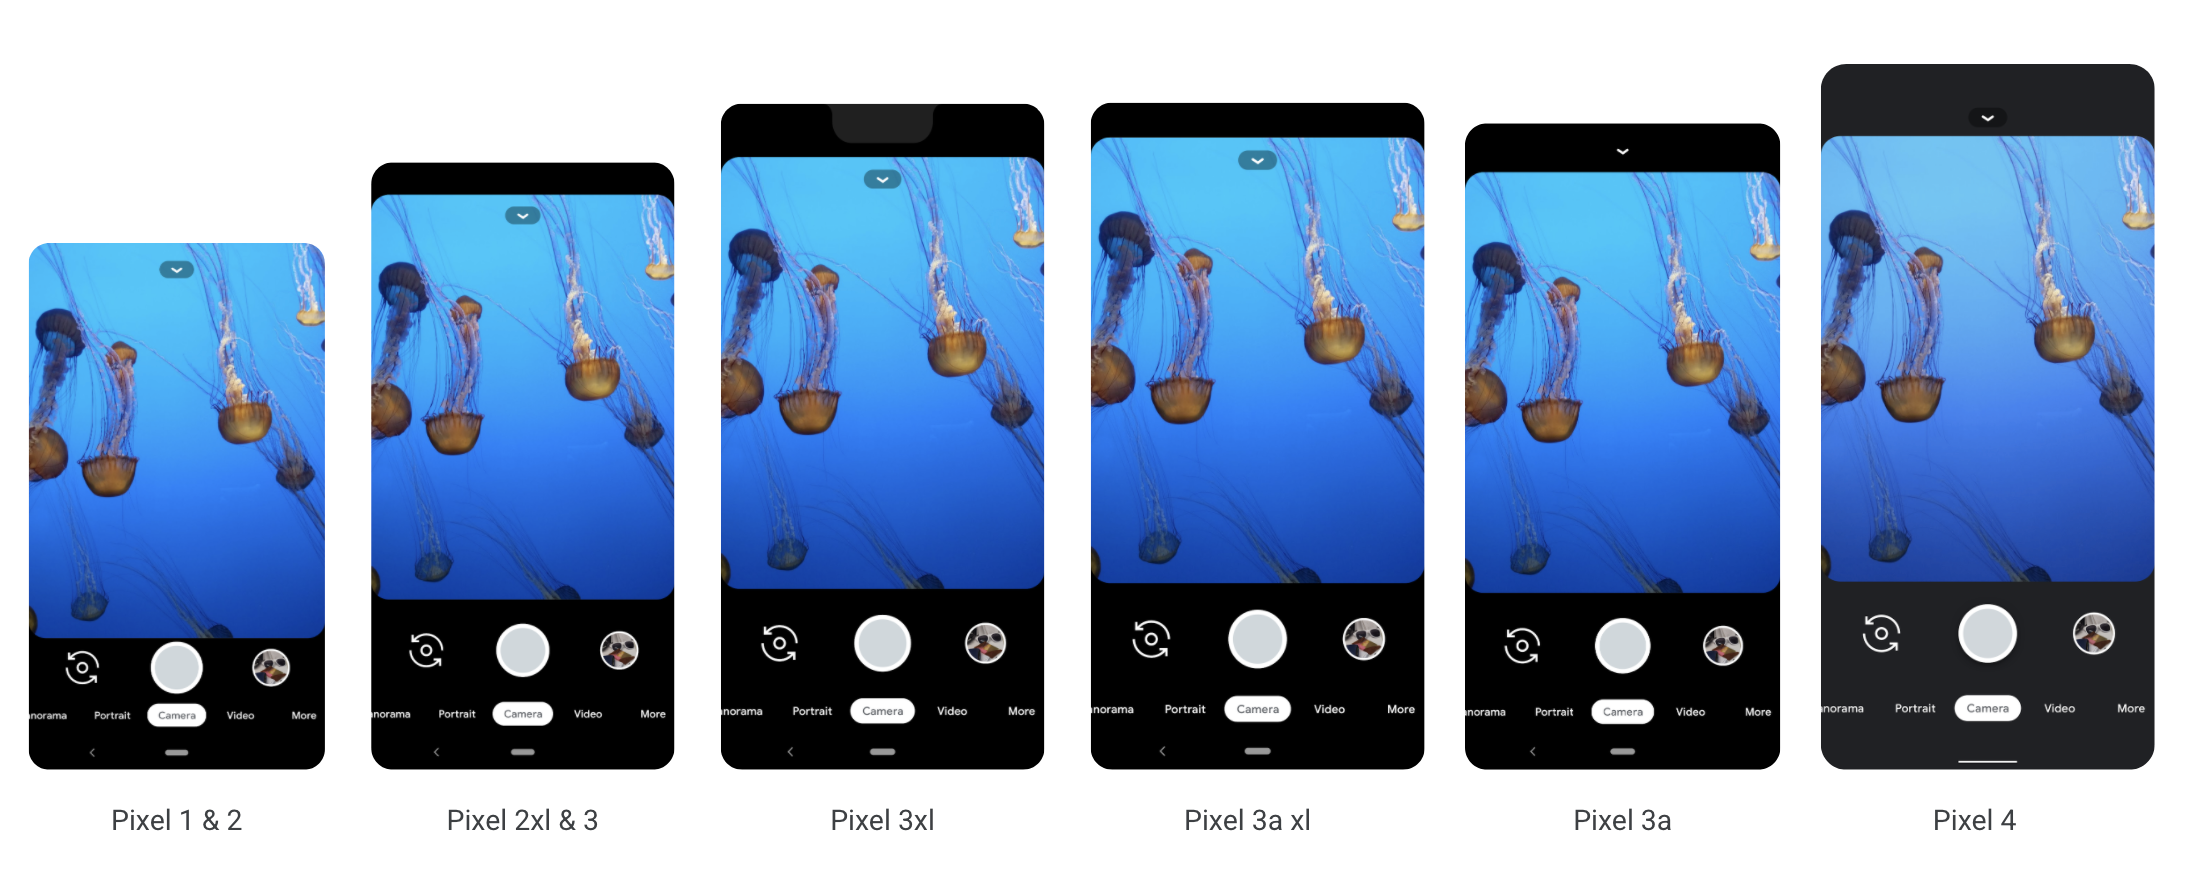 Google Pixel devices